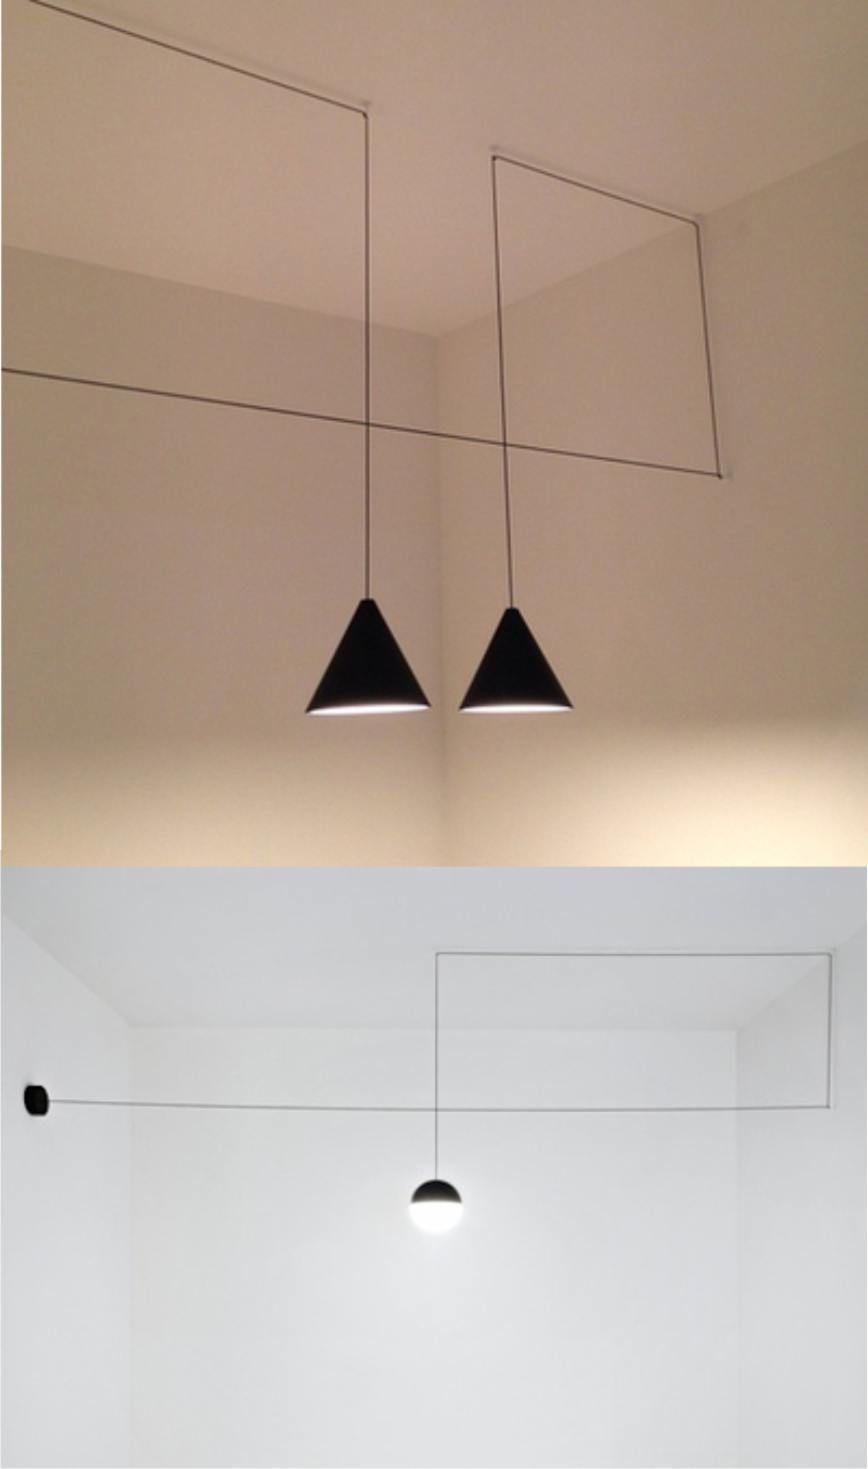 lampara colgante hilo muy ingenioso.jpg 868×1.469 píxeles